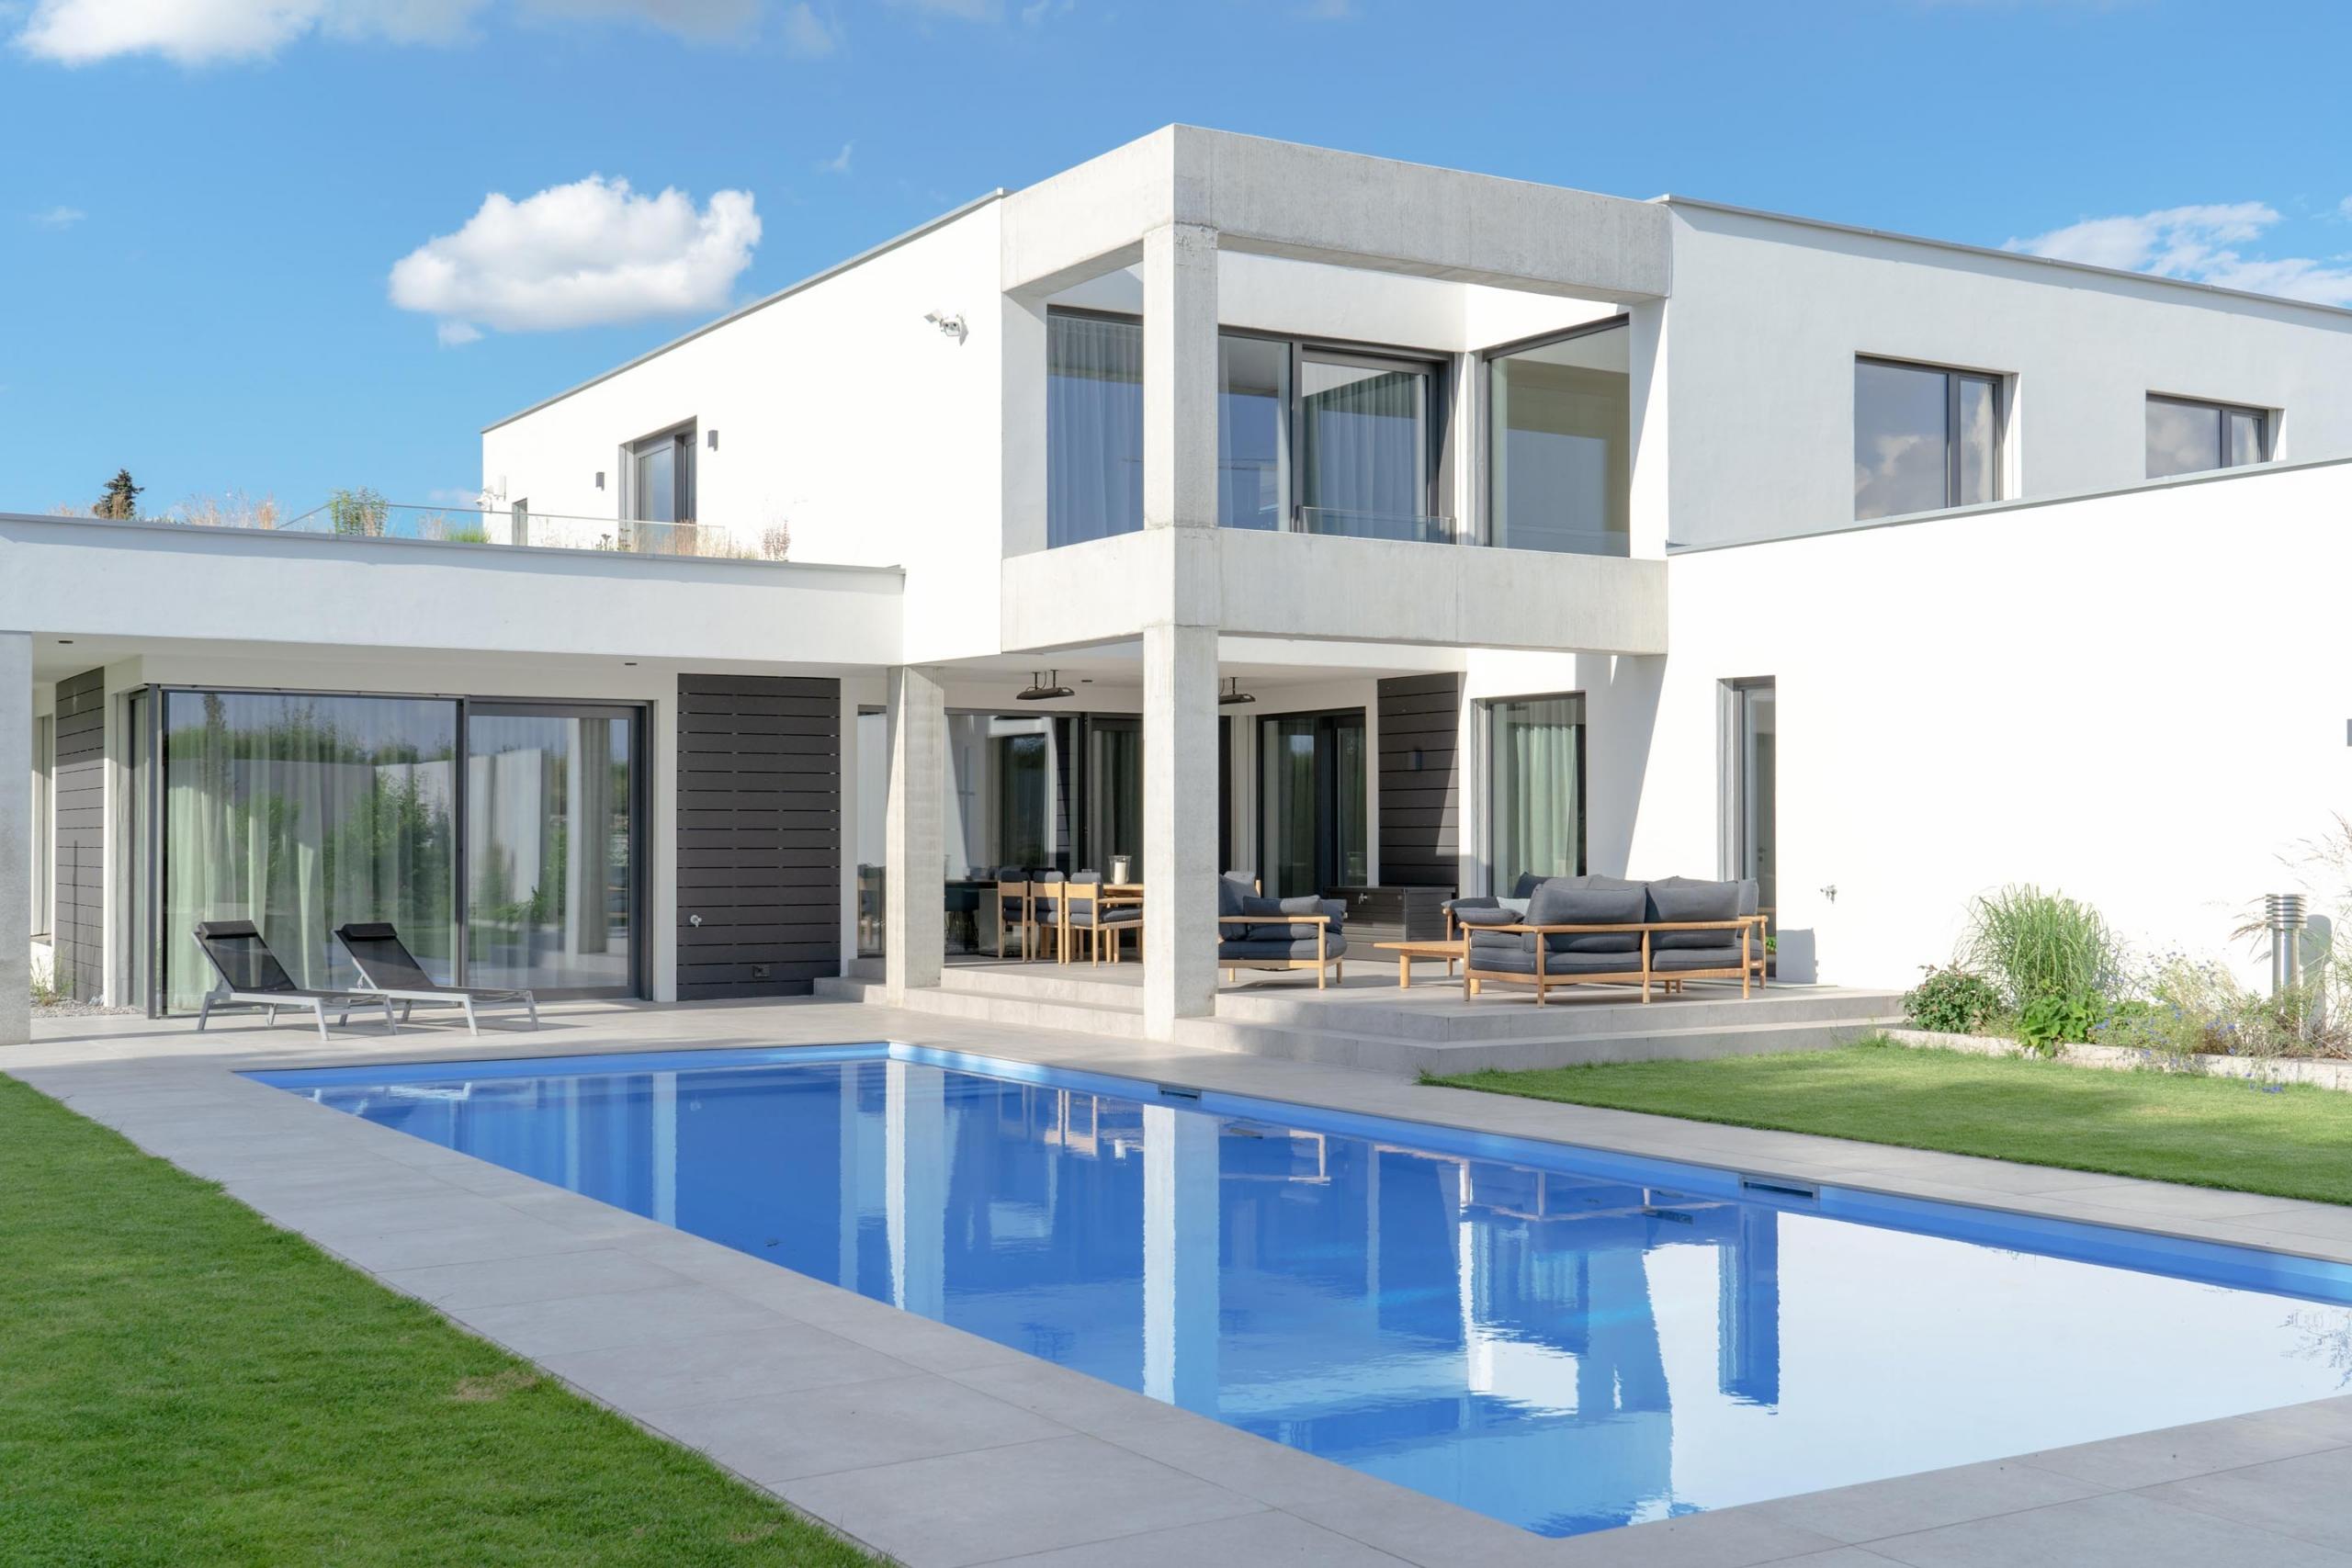 Büro Kolbinger Projekt Haus S Ansicht Pool